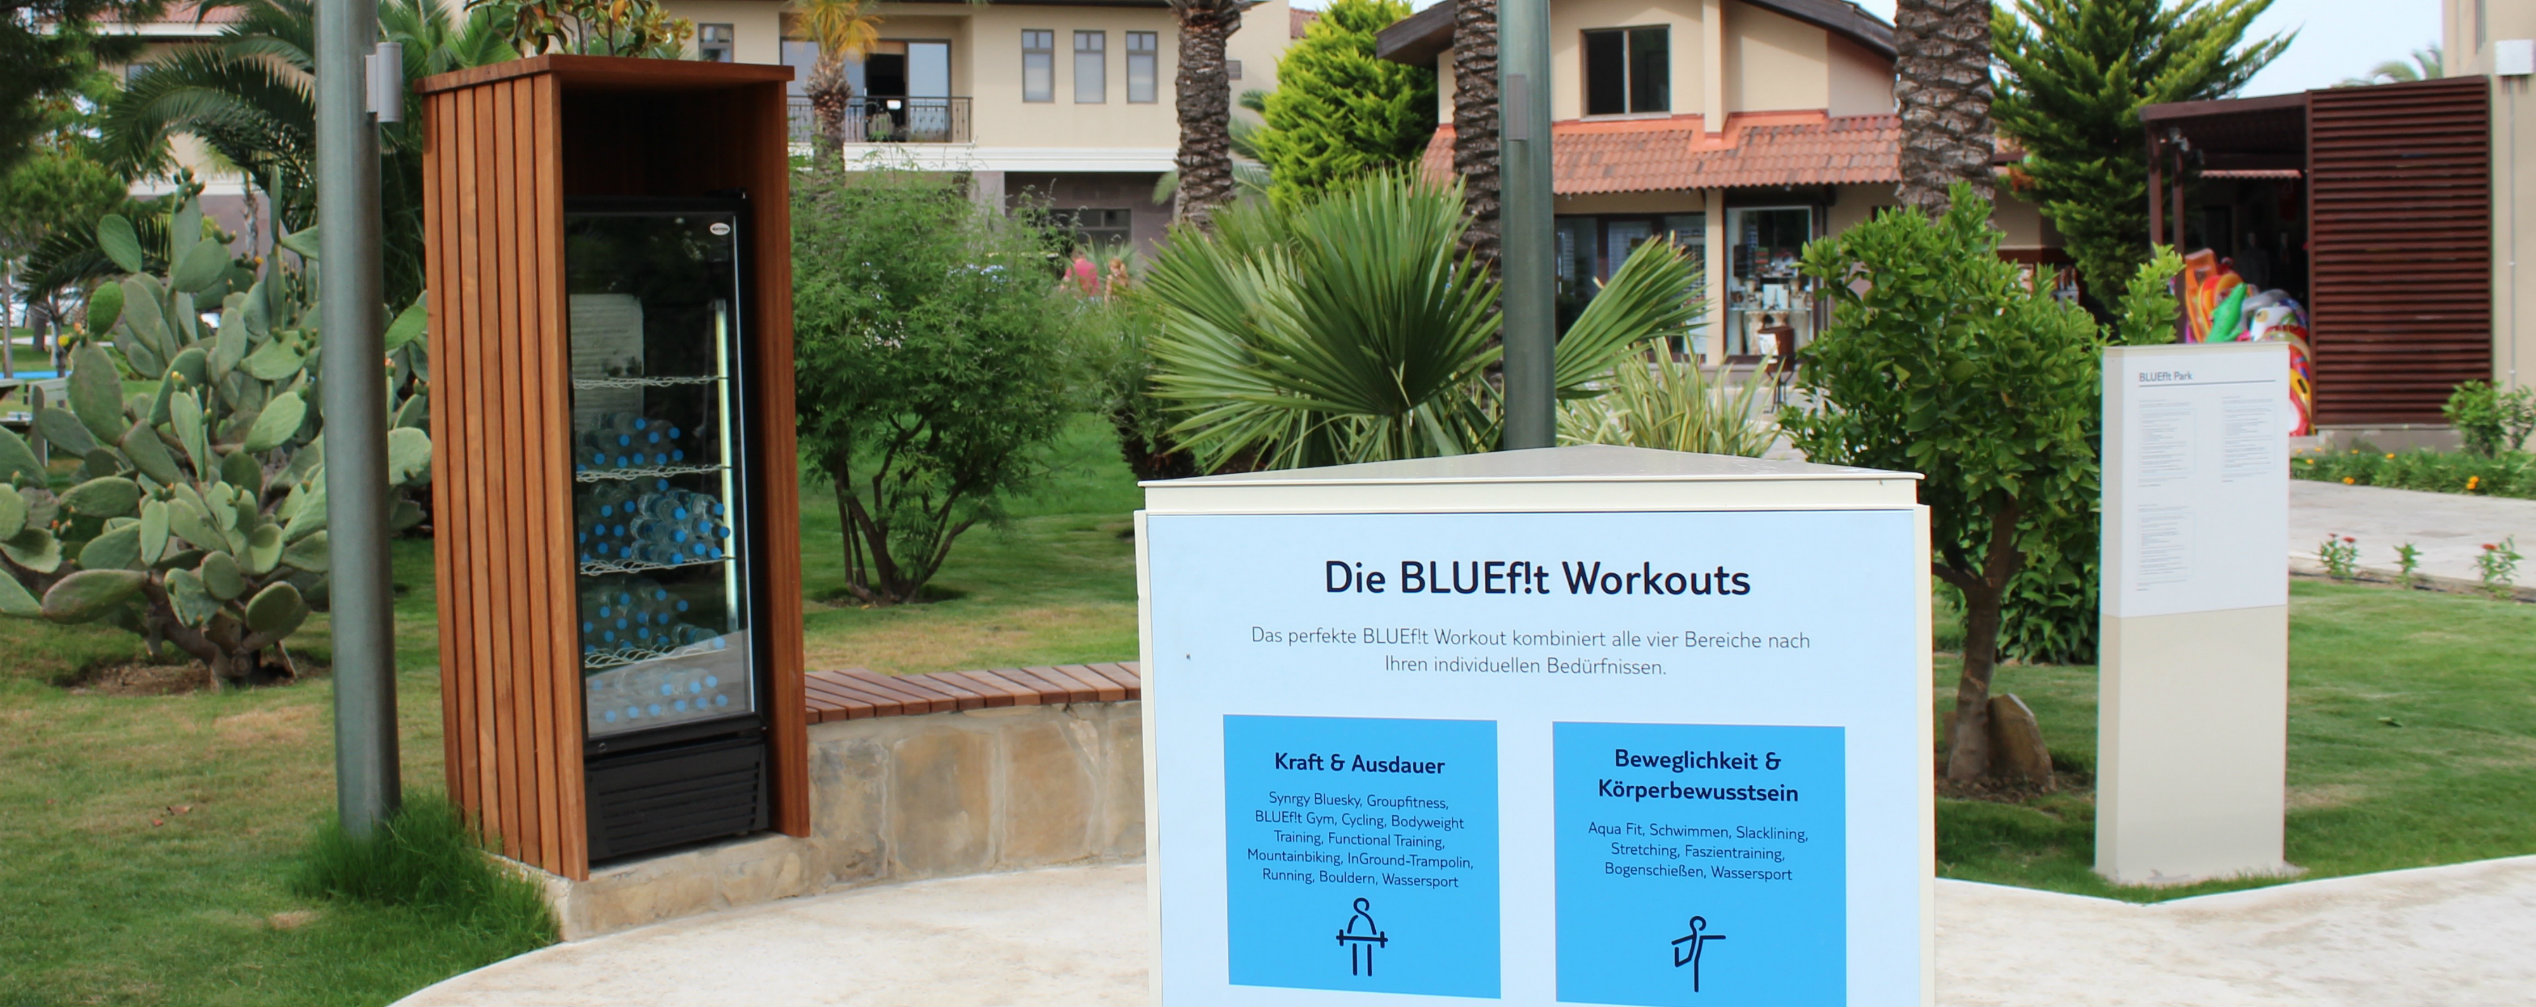 Bodyweight Course im BLUEf!t Park